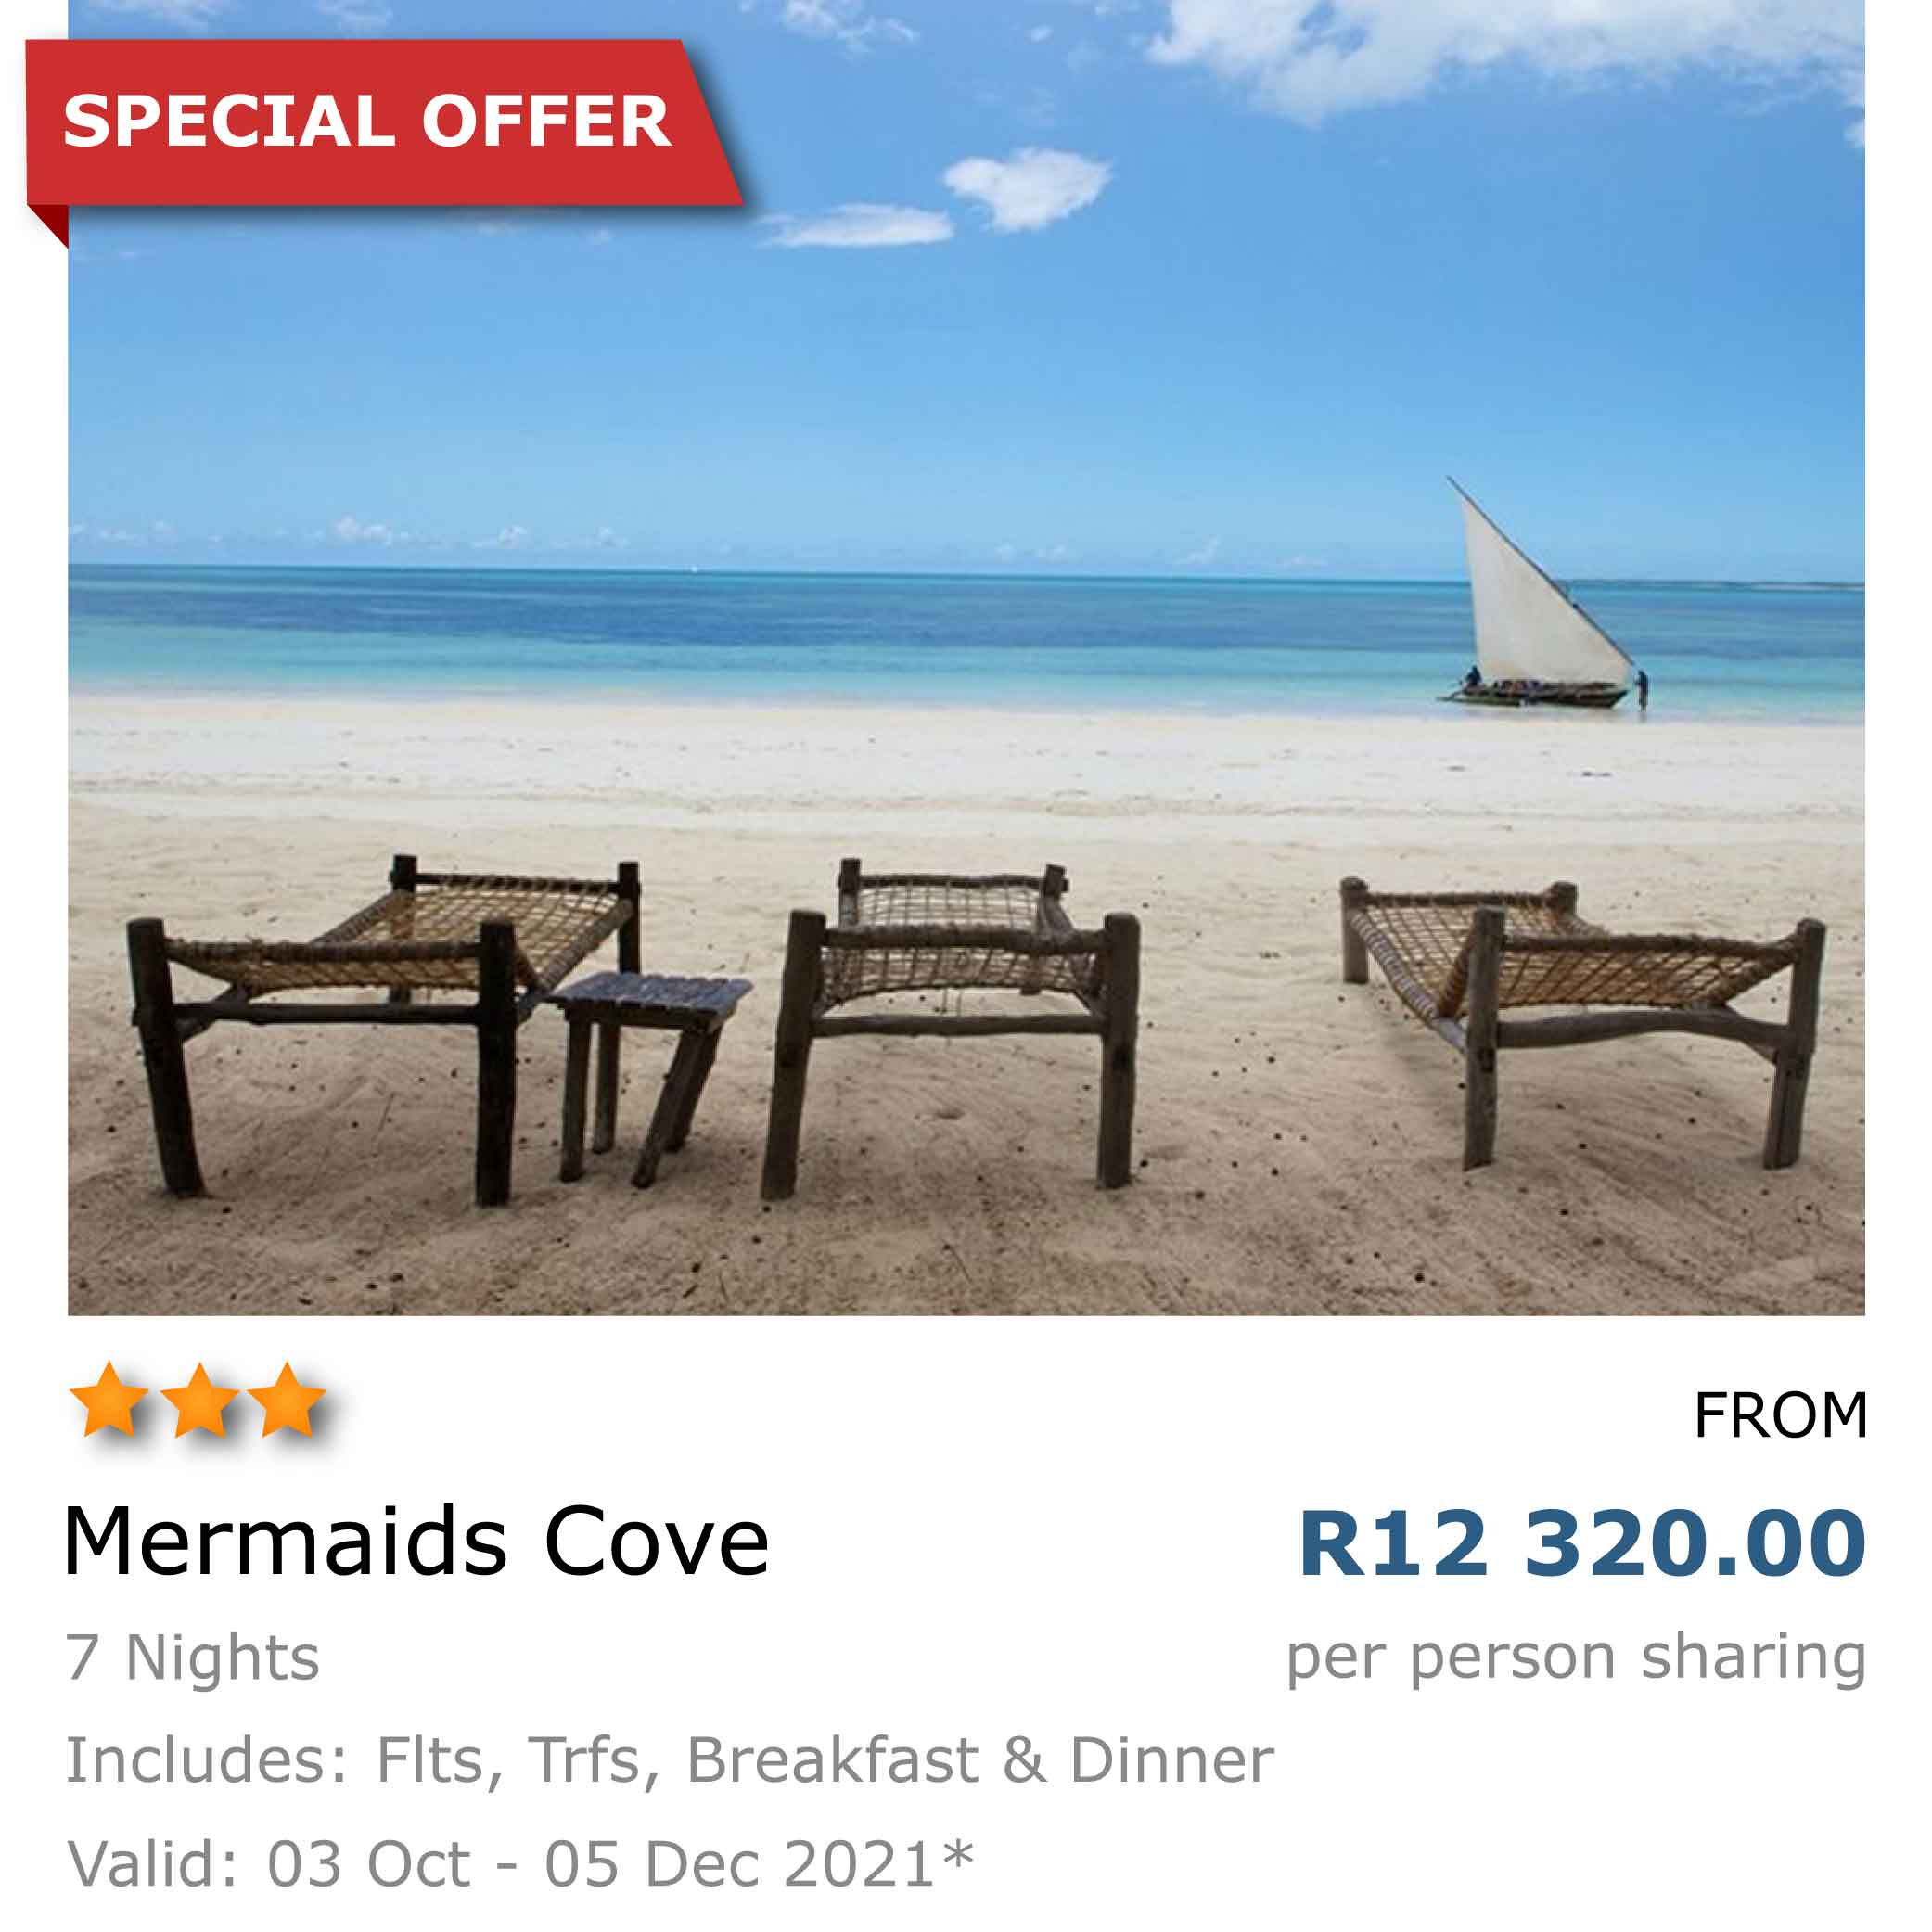 Mermaids Cove